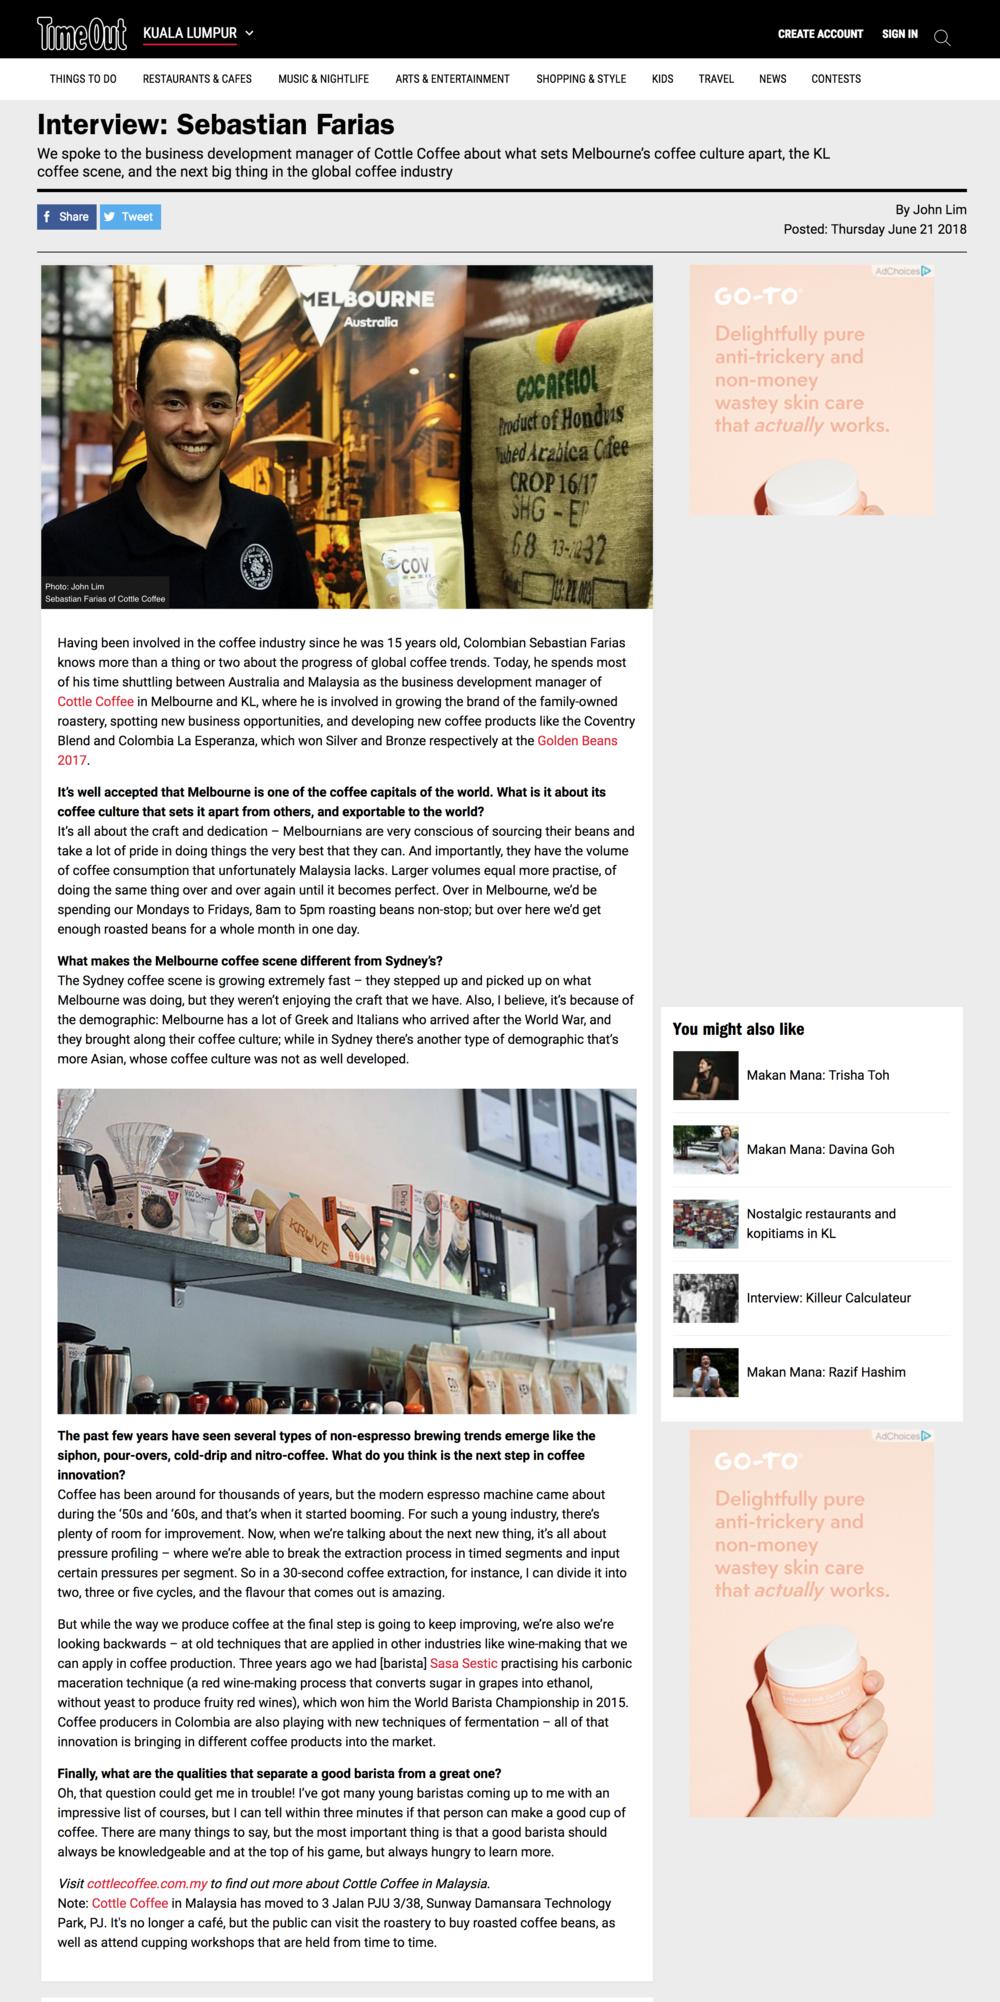 screencapture-timeout-kuala-lumpur-restaurants-interview-sebastian-farias-2018-07-09-15_24_11.png